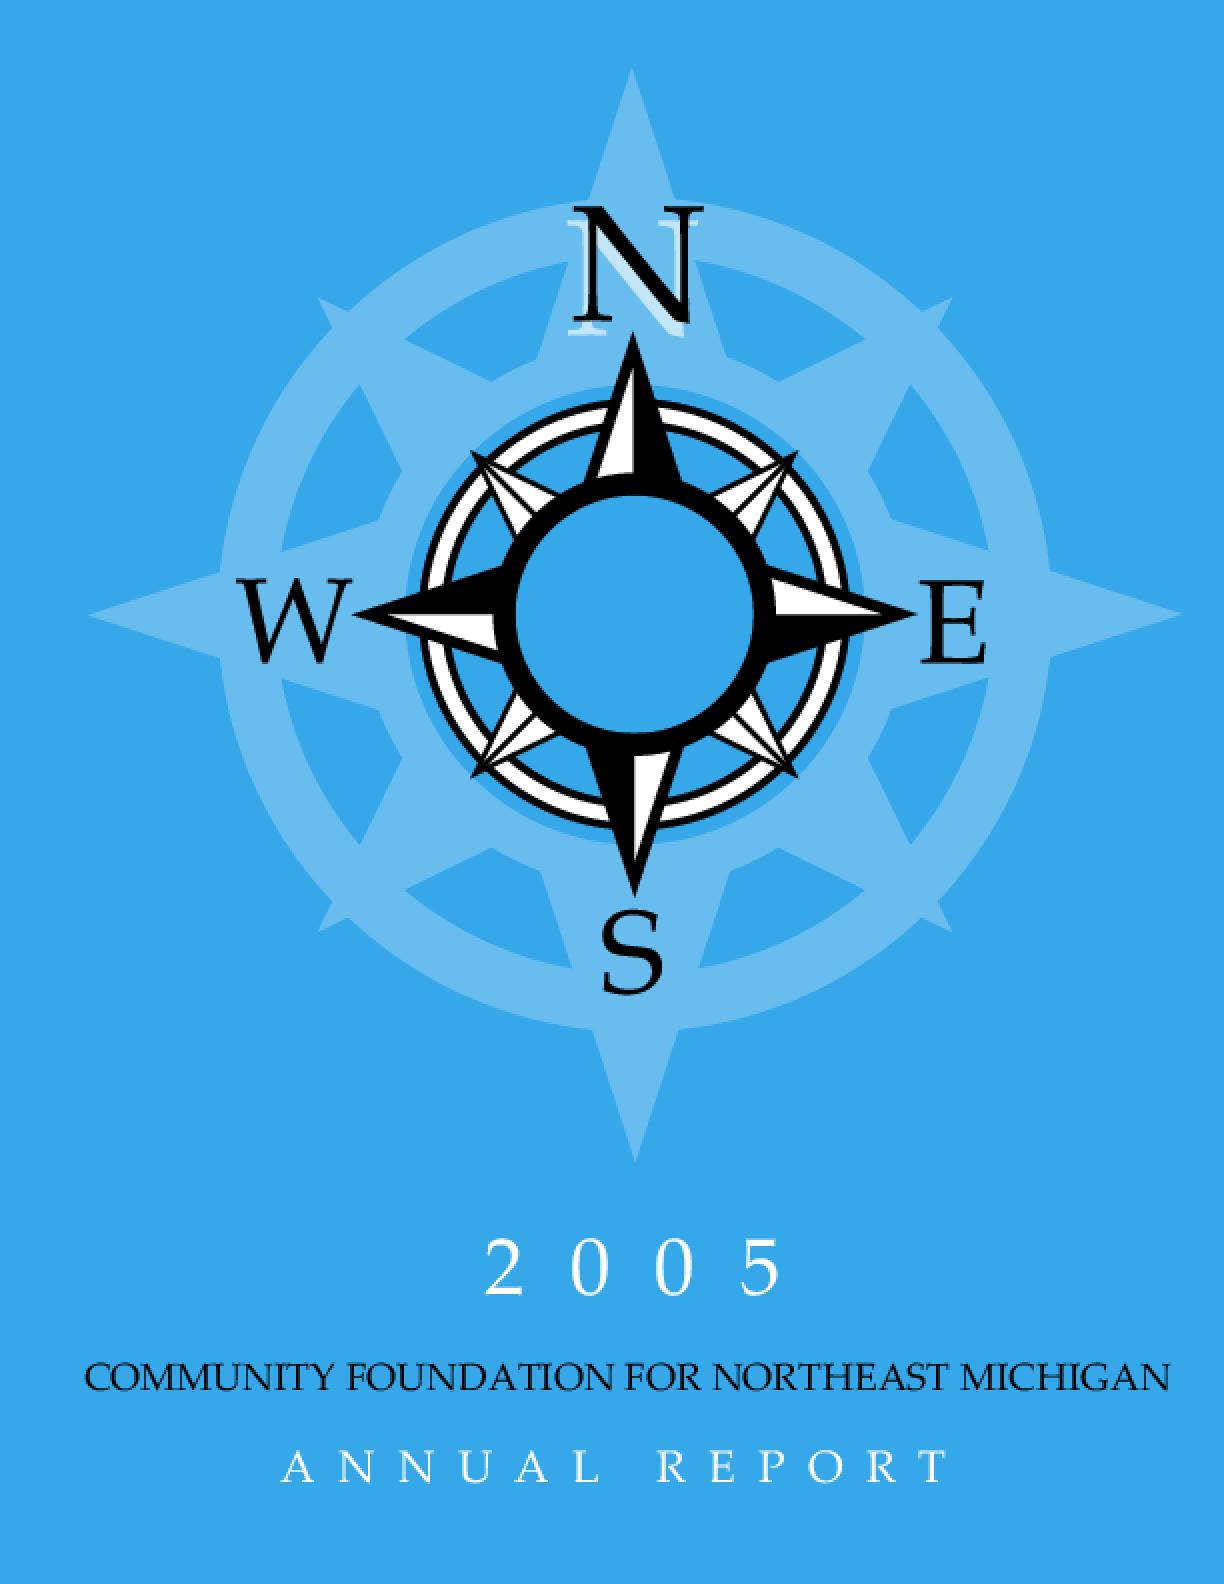 Community Foundation for Northeast Michigan - 2005 Annual Report